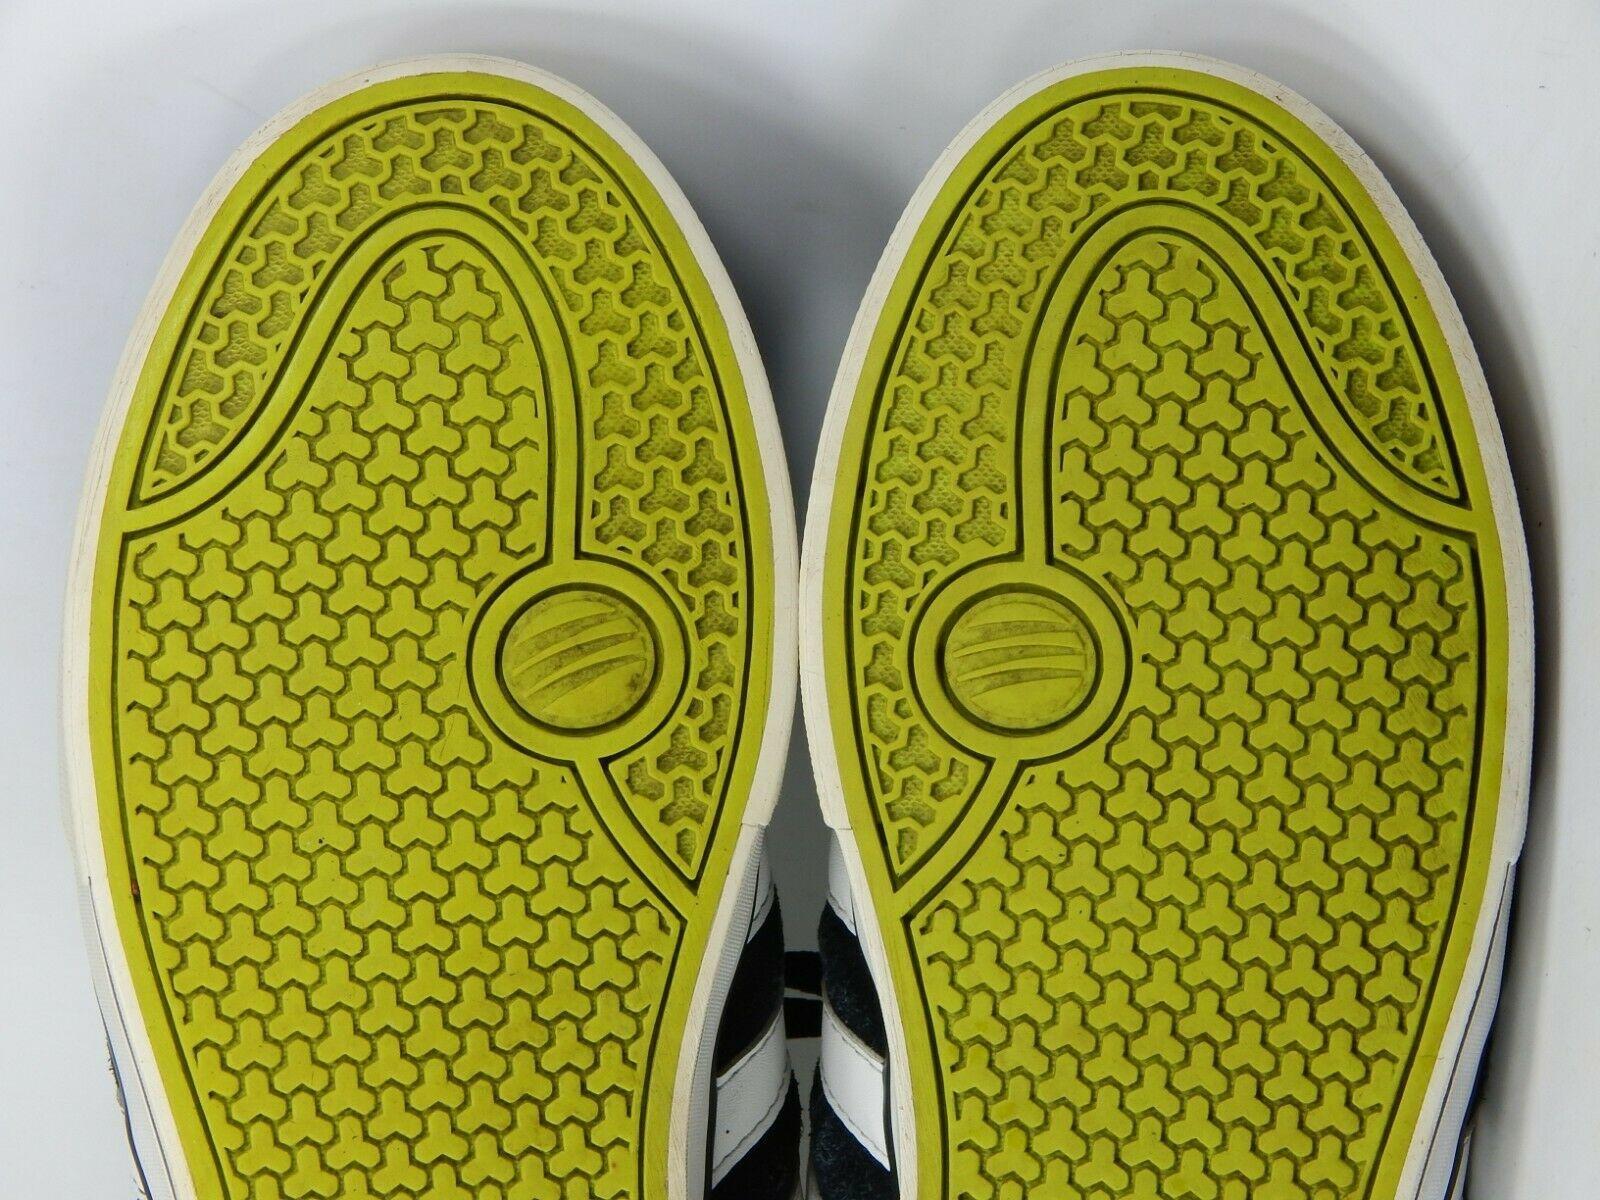 Adidas Neo se Daily Vulc Misura 12 M (D) Eu 46 2/3 Uomo Scarpe Sneakers U44858